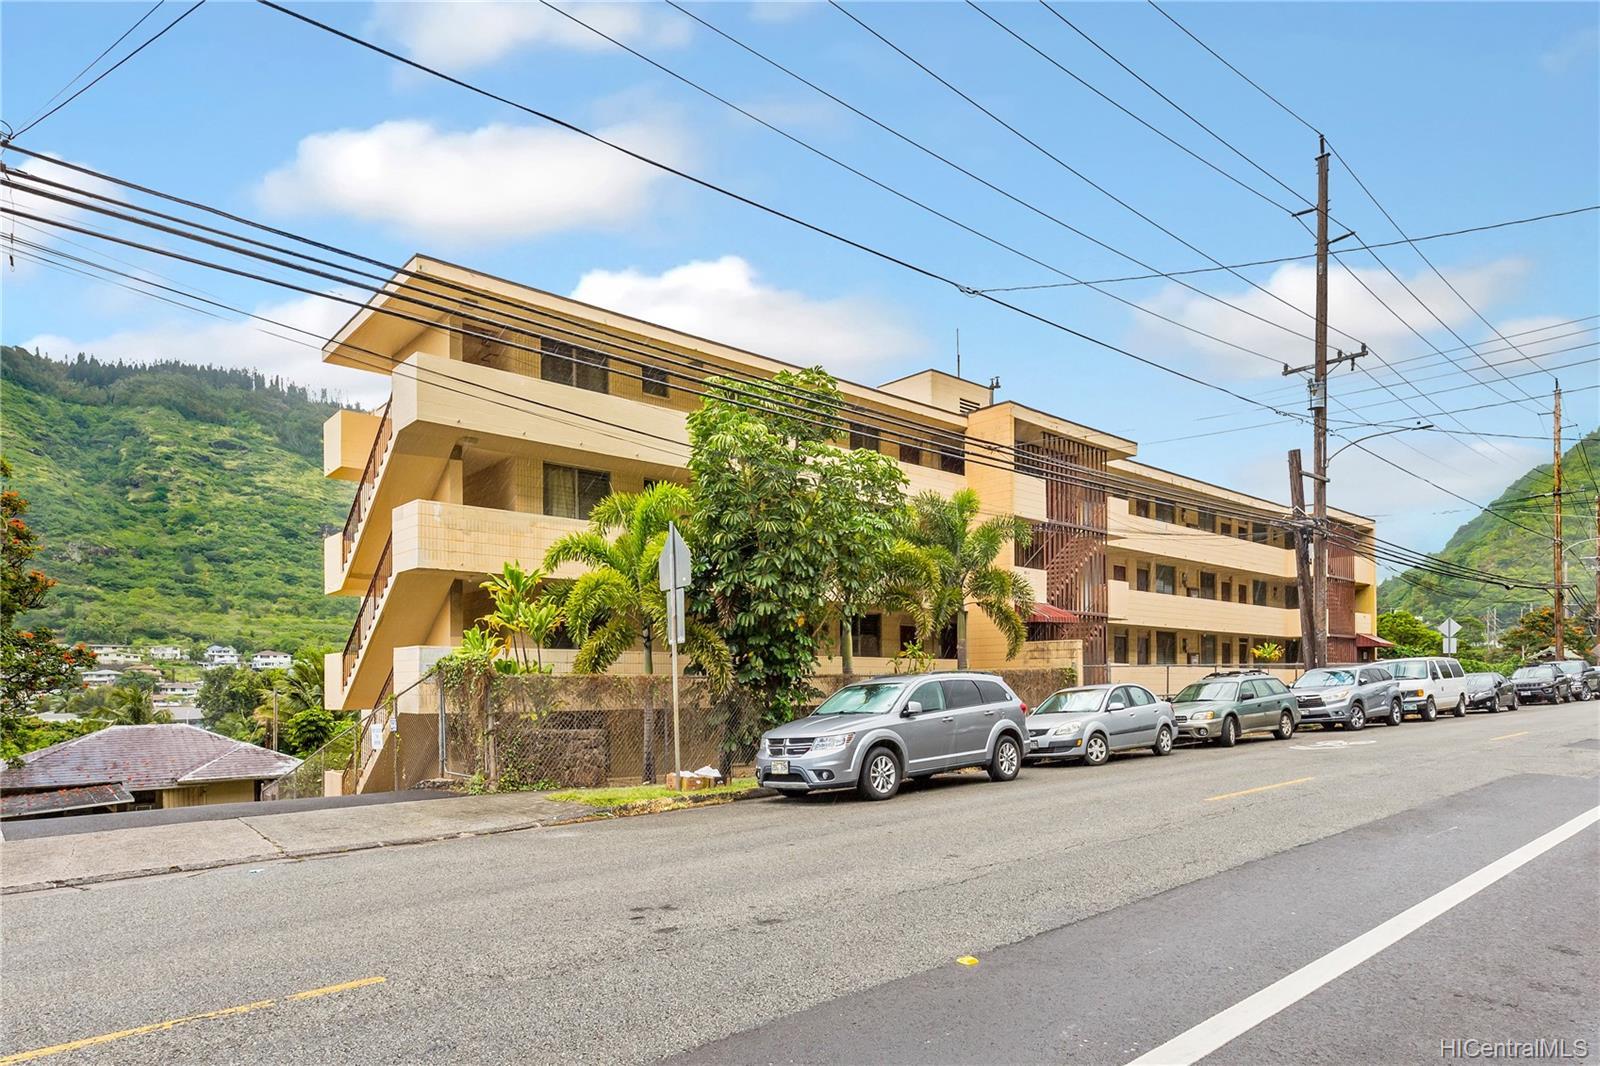 Palolo garden condo # 102A, Honolulu, Hawaii - photo 10 of 10